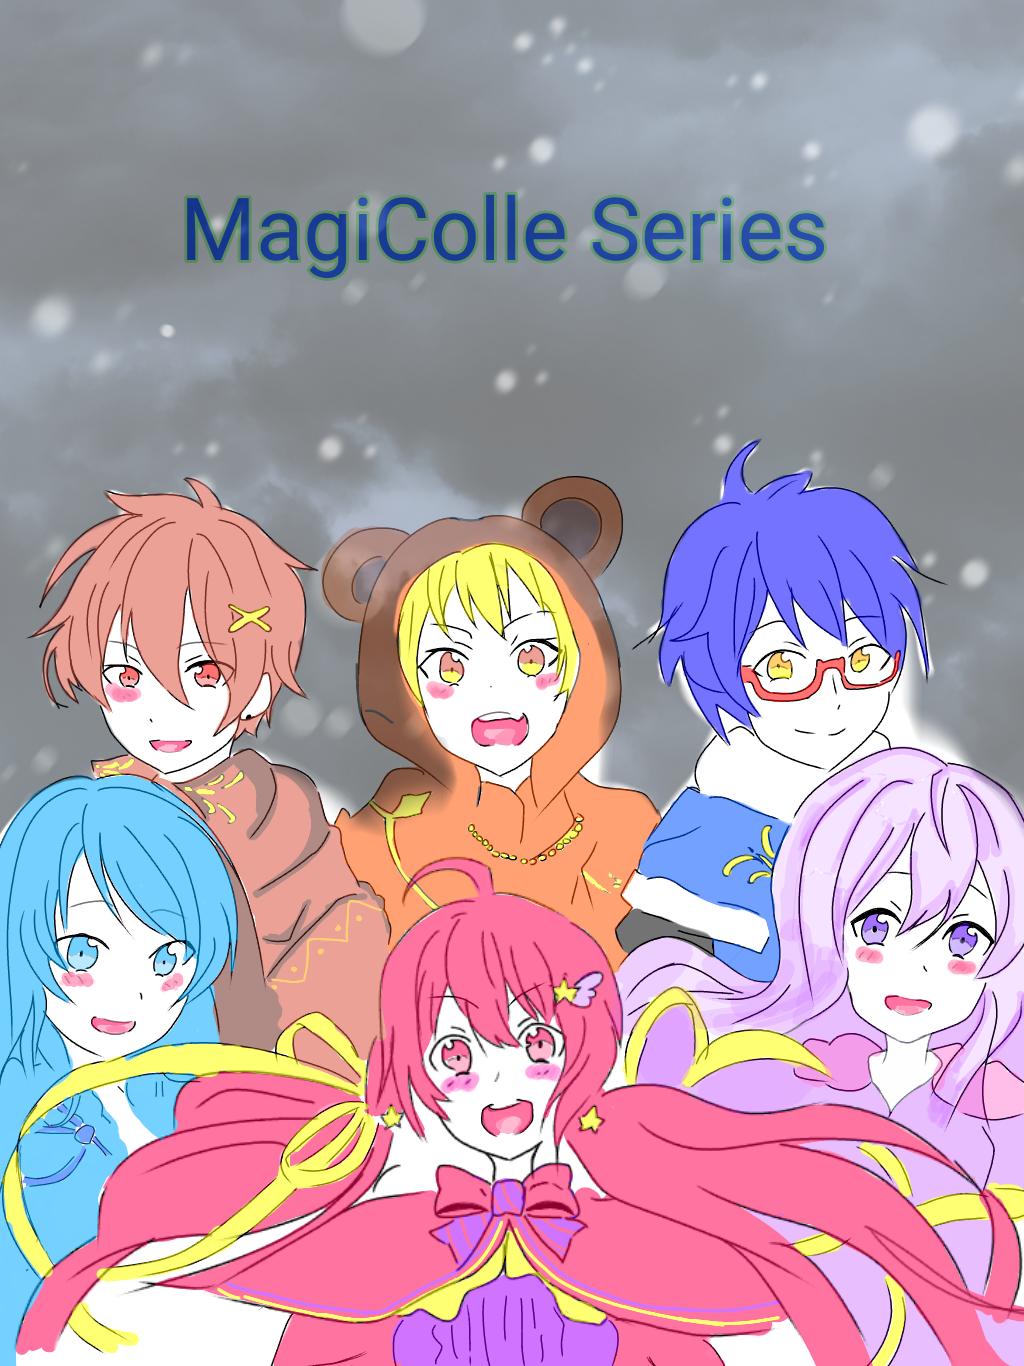 MagiColle The Series